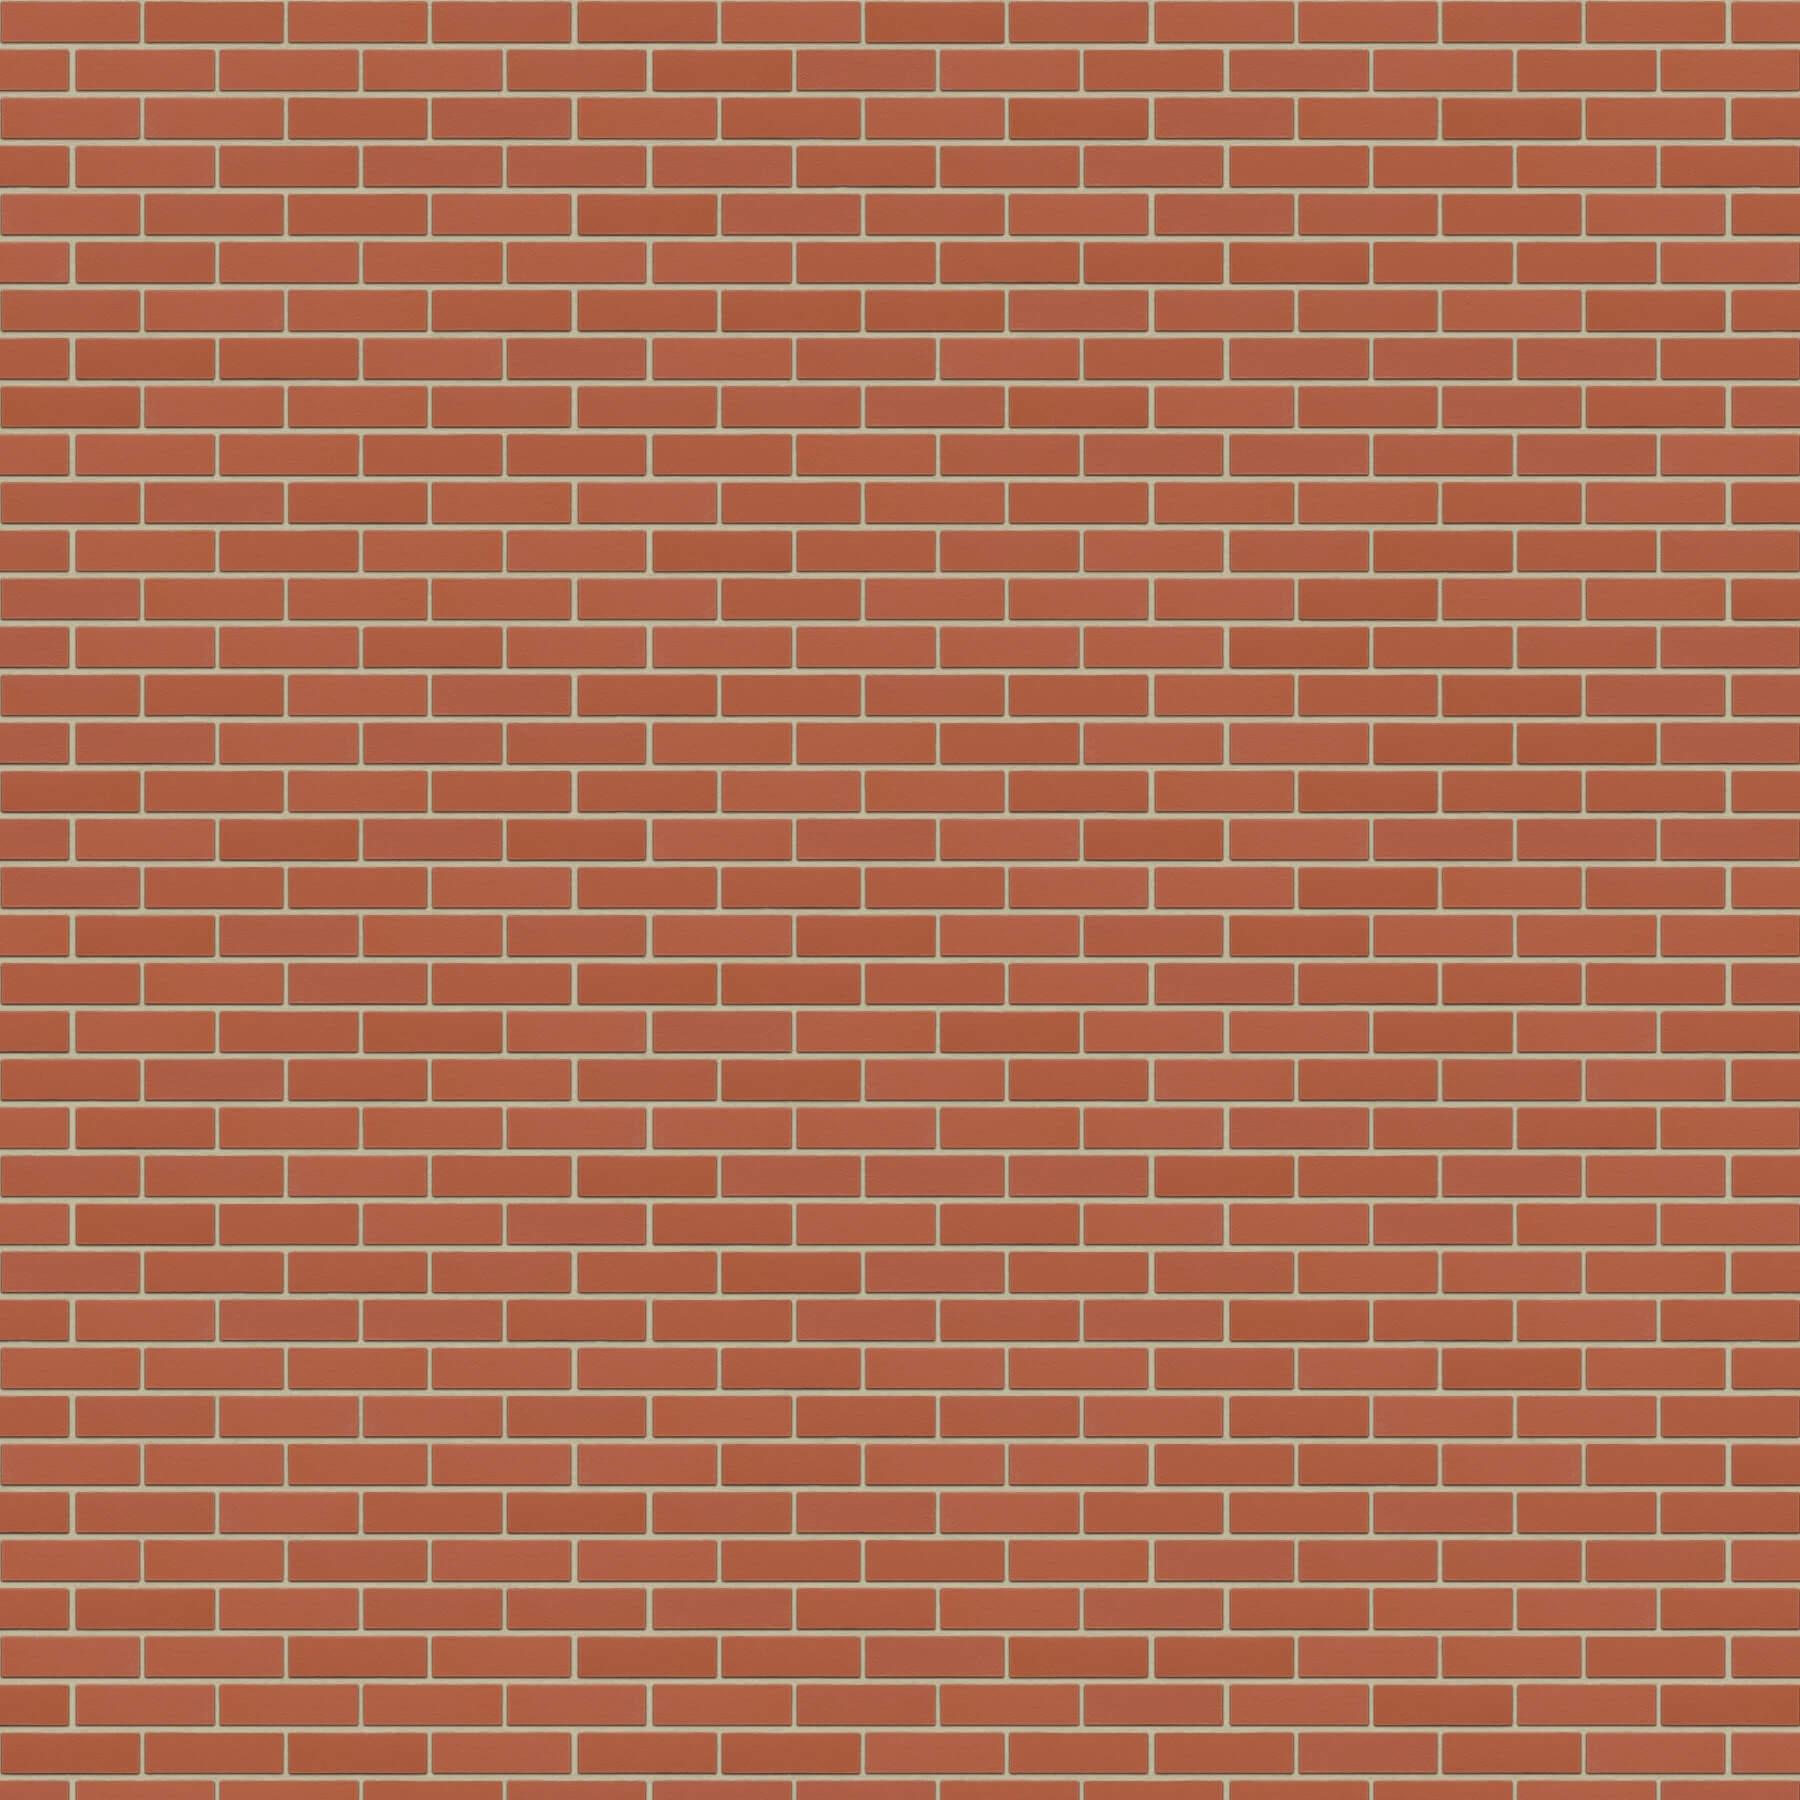 Puna-cigla-FeldHaus-Klinker-brick-house-nf-k-400-Bez Fuga